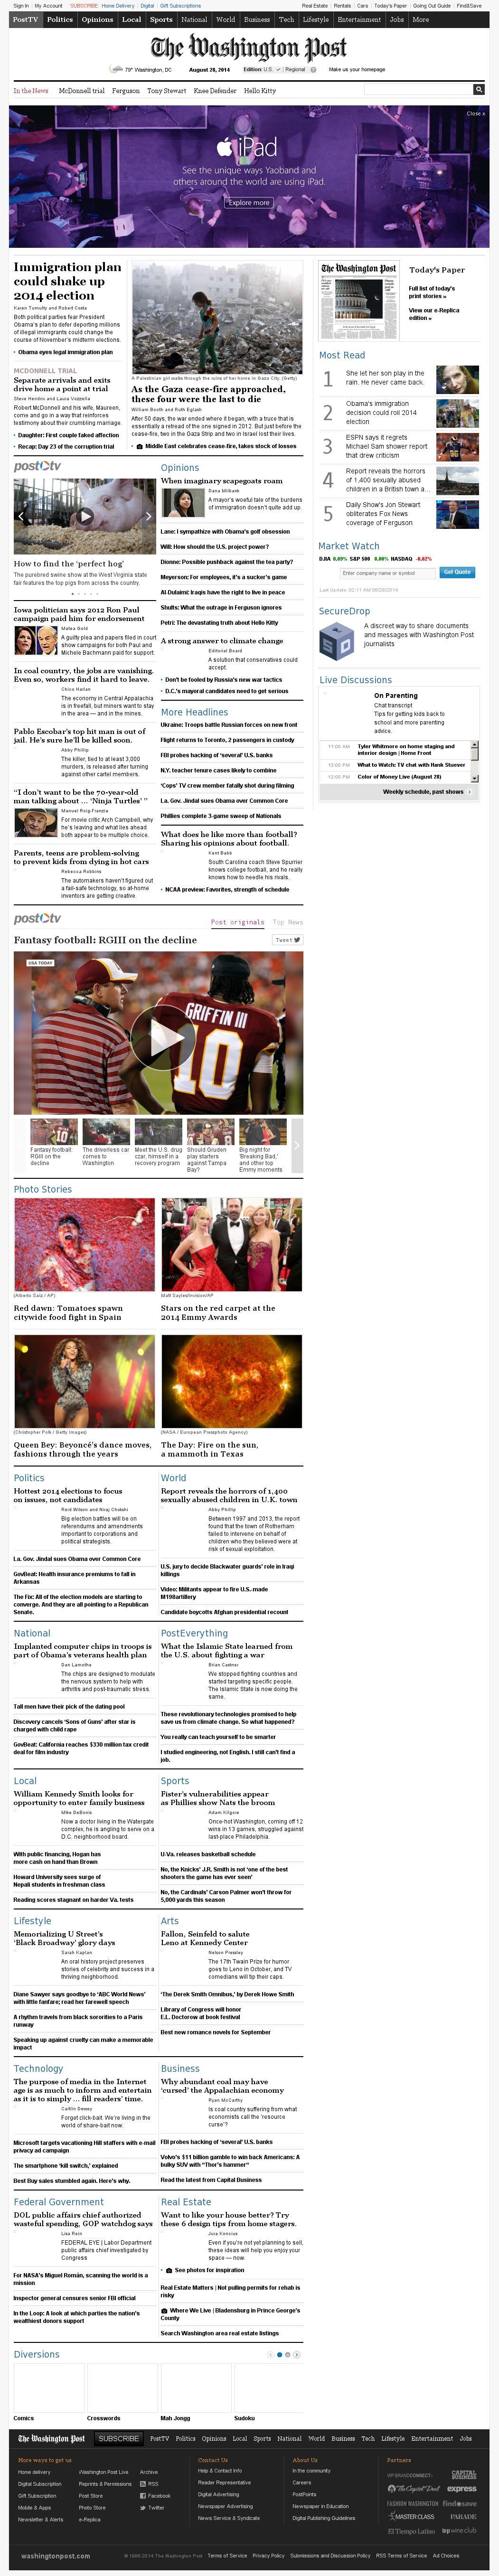 The Washington Post at Thursday Aug. 28, 2014, 6:23 a.m. UTC